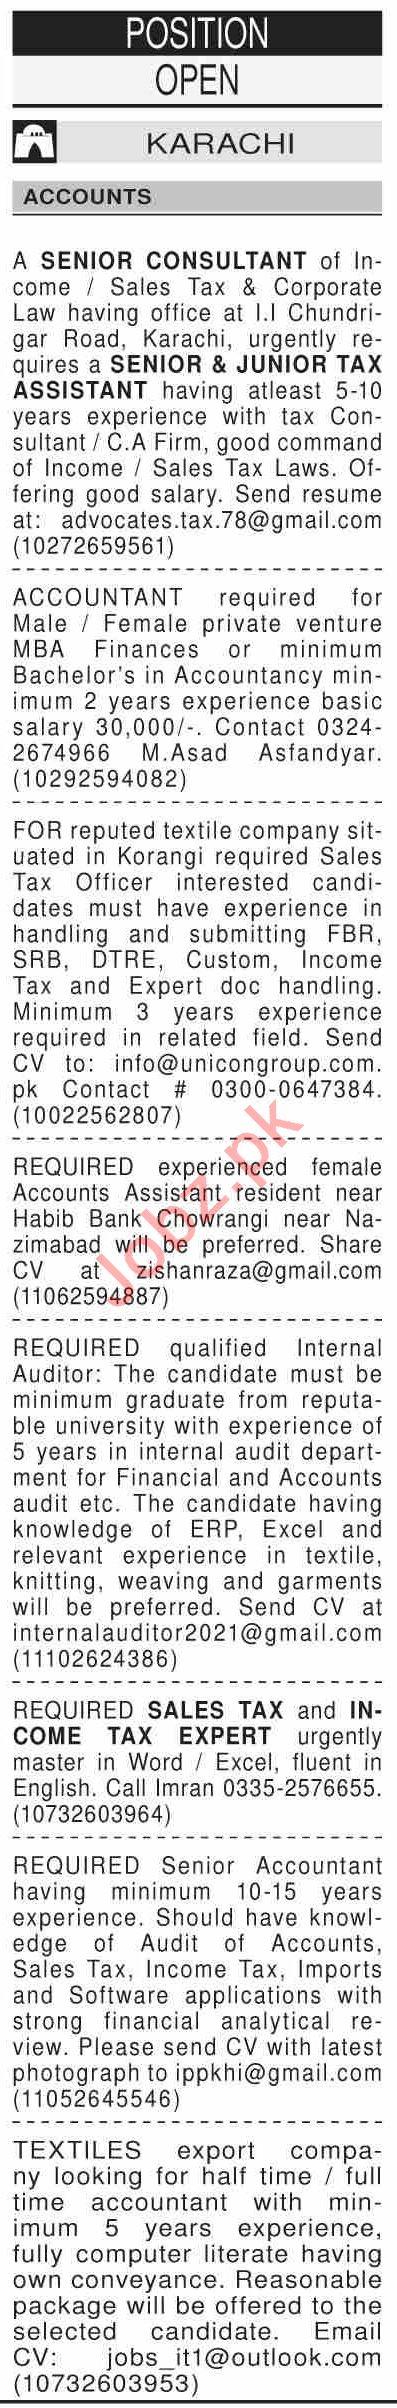 Dawn Sunday Classified Ads 27 Dec 2020 for Accounts Staff